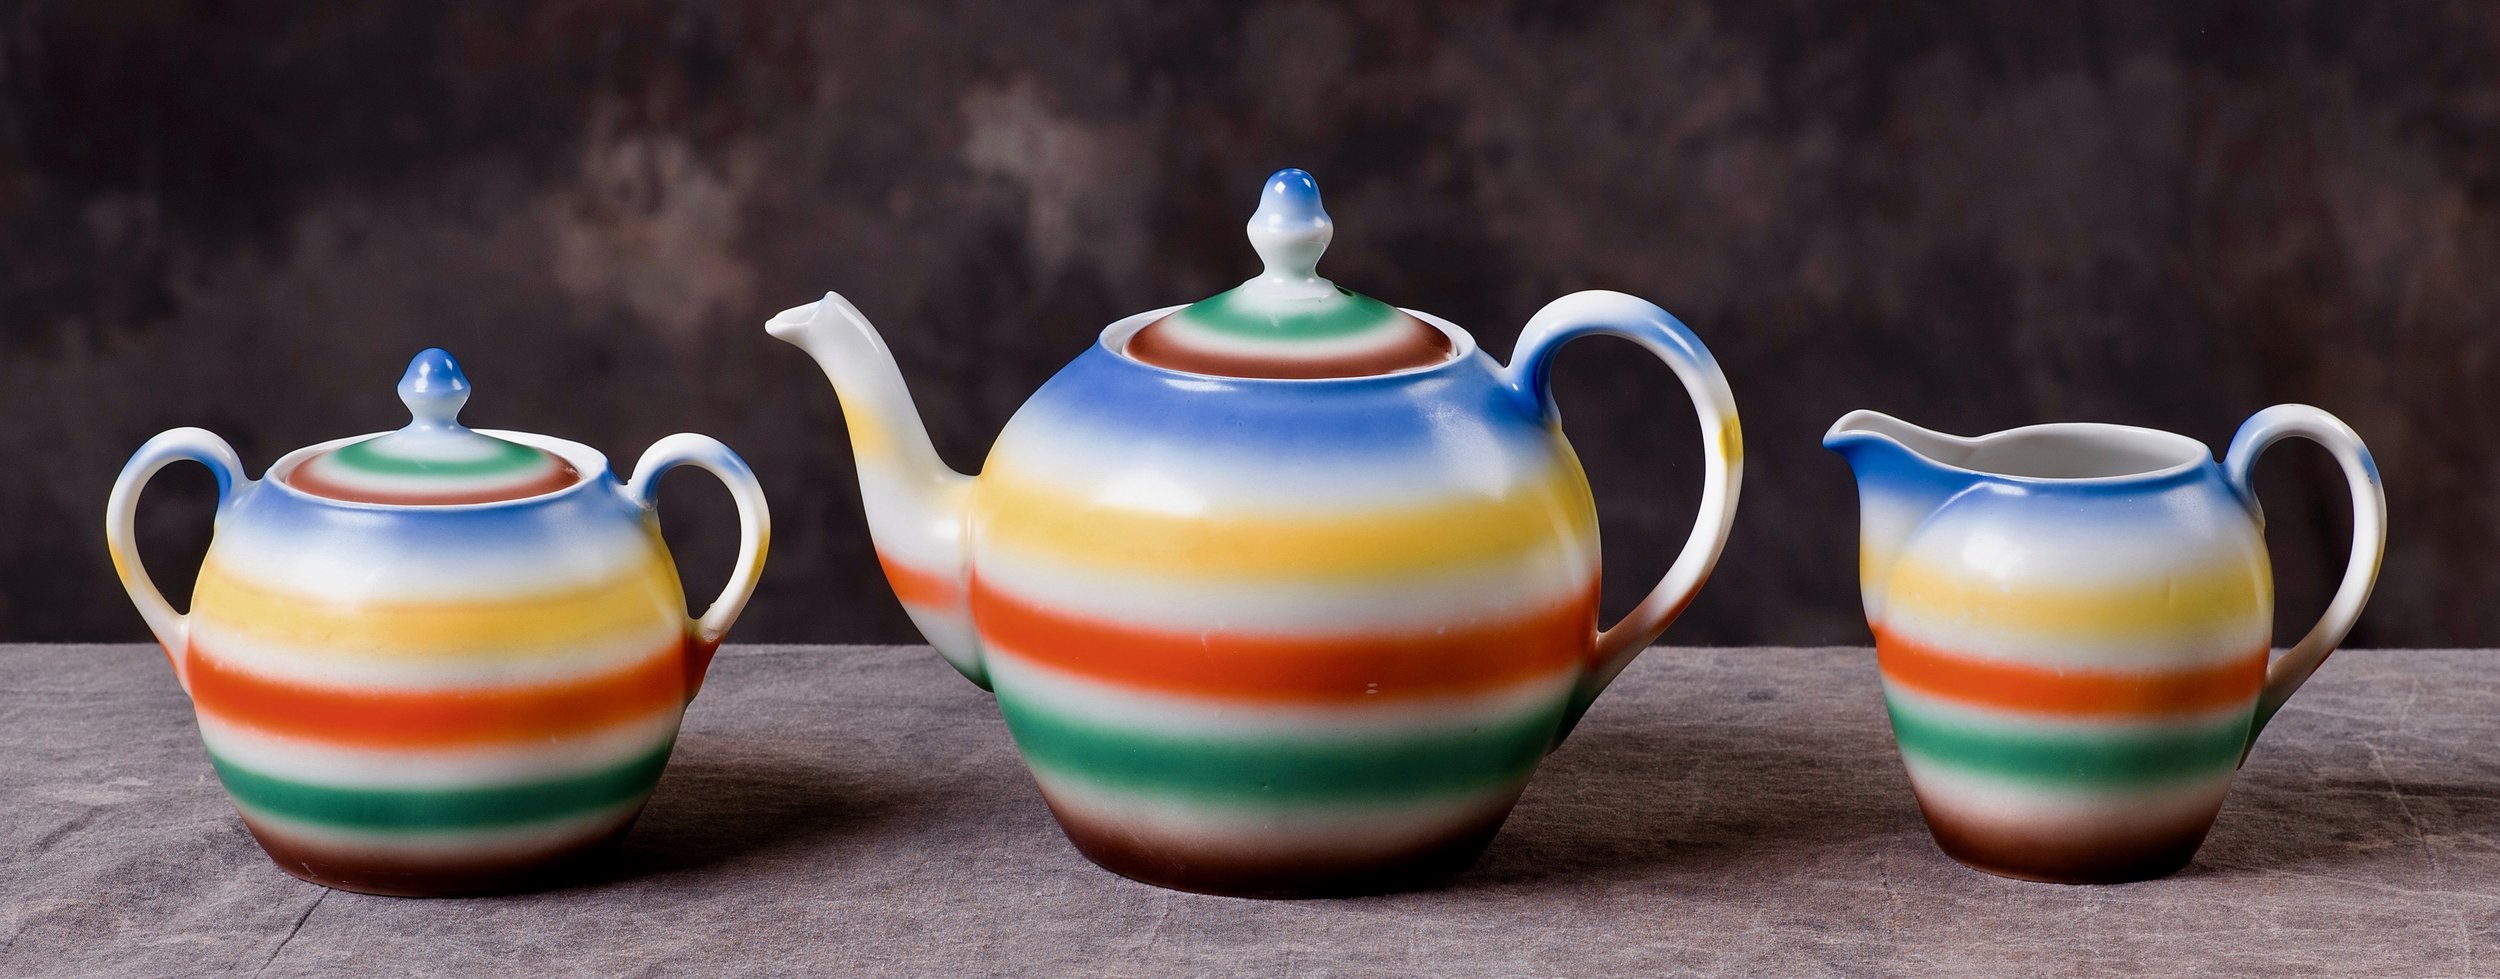 #104 Tea Pot, form 1875, Waldershof, ca.1930. Blue/green mfr.; Blind 1875; 10.8 cm H, 7.3 cm opening, 8.5 cm base Ø. RM172 #105 Sugar, form 1866, Waldershof, ca.1930. Blue/green mfr.; Blind 1866; 8 cm H (without lid), 6.5 cm opening, 7 cm base Ø. RM173 #106 Creamer, form 1806, Waldershof, ca.1930. Blue/green mfr.; Blind 1806; 8.5 cm H, 4.3 cm opening, 5.2 cm base Ø. RM174